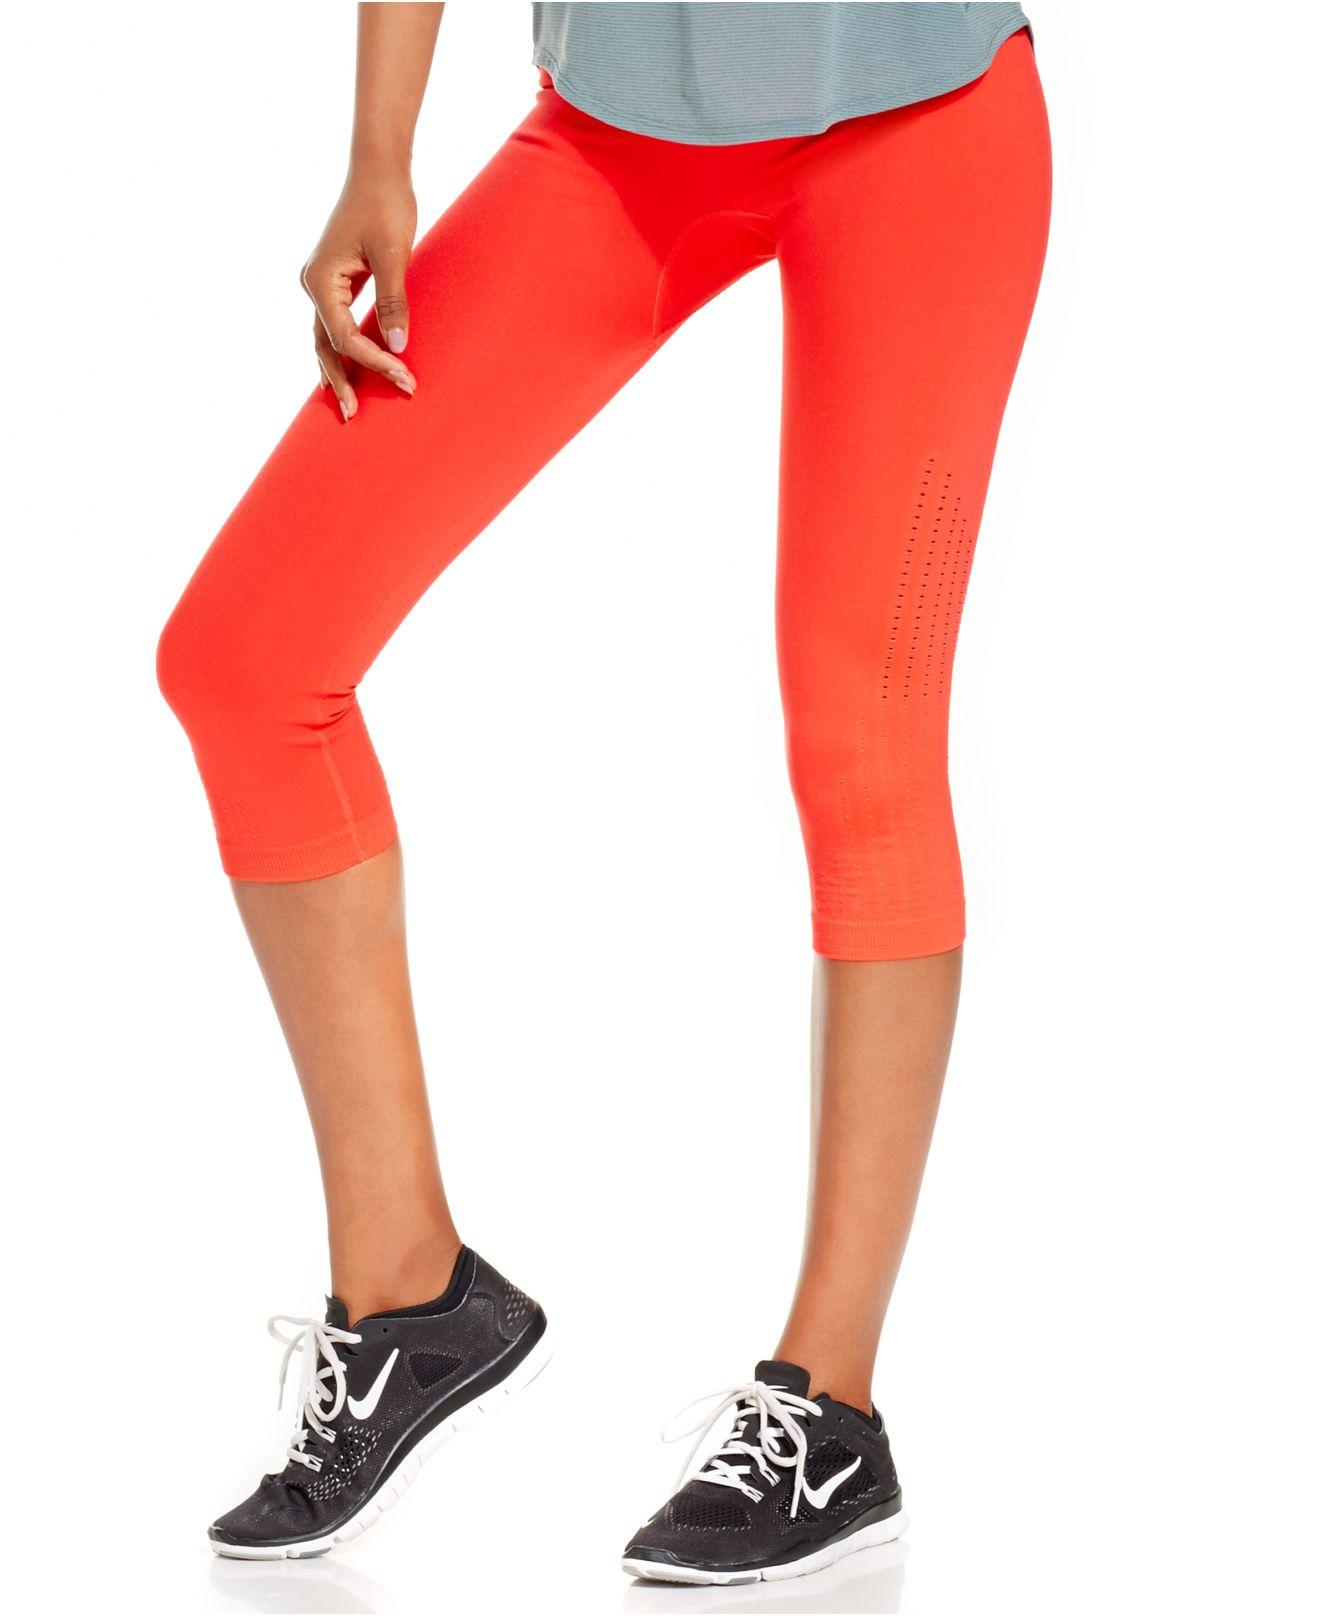 Nike Pro Limitless Dri-Fit Capri Leggings in Orange | Lyst